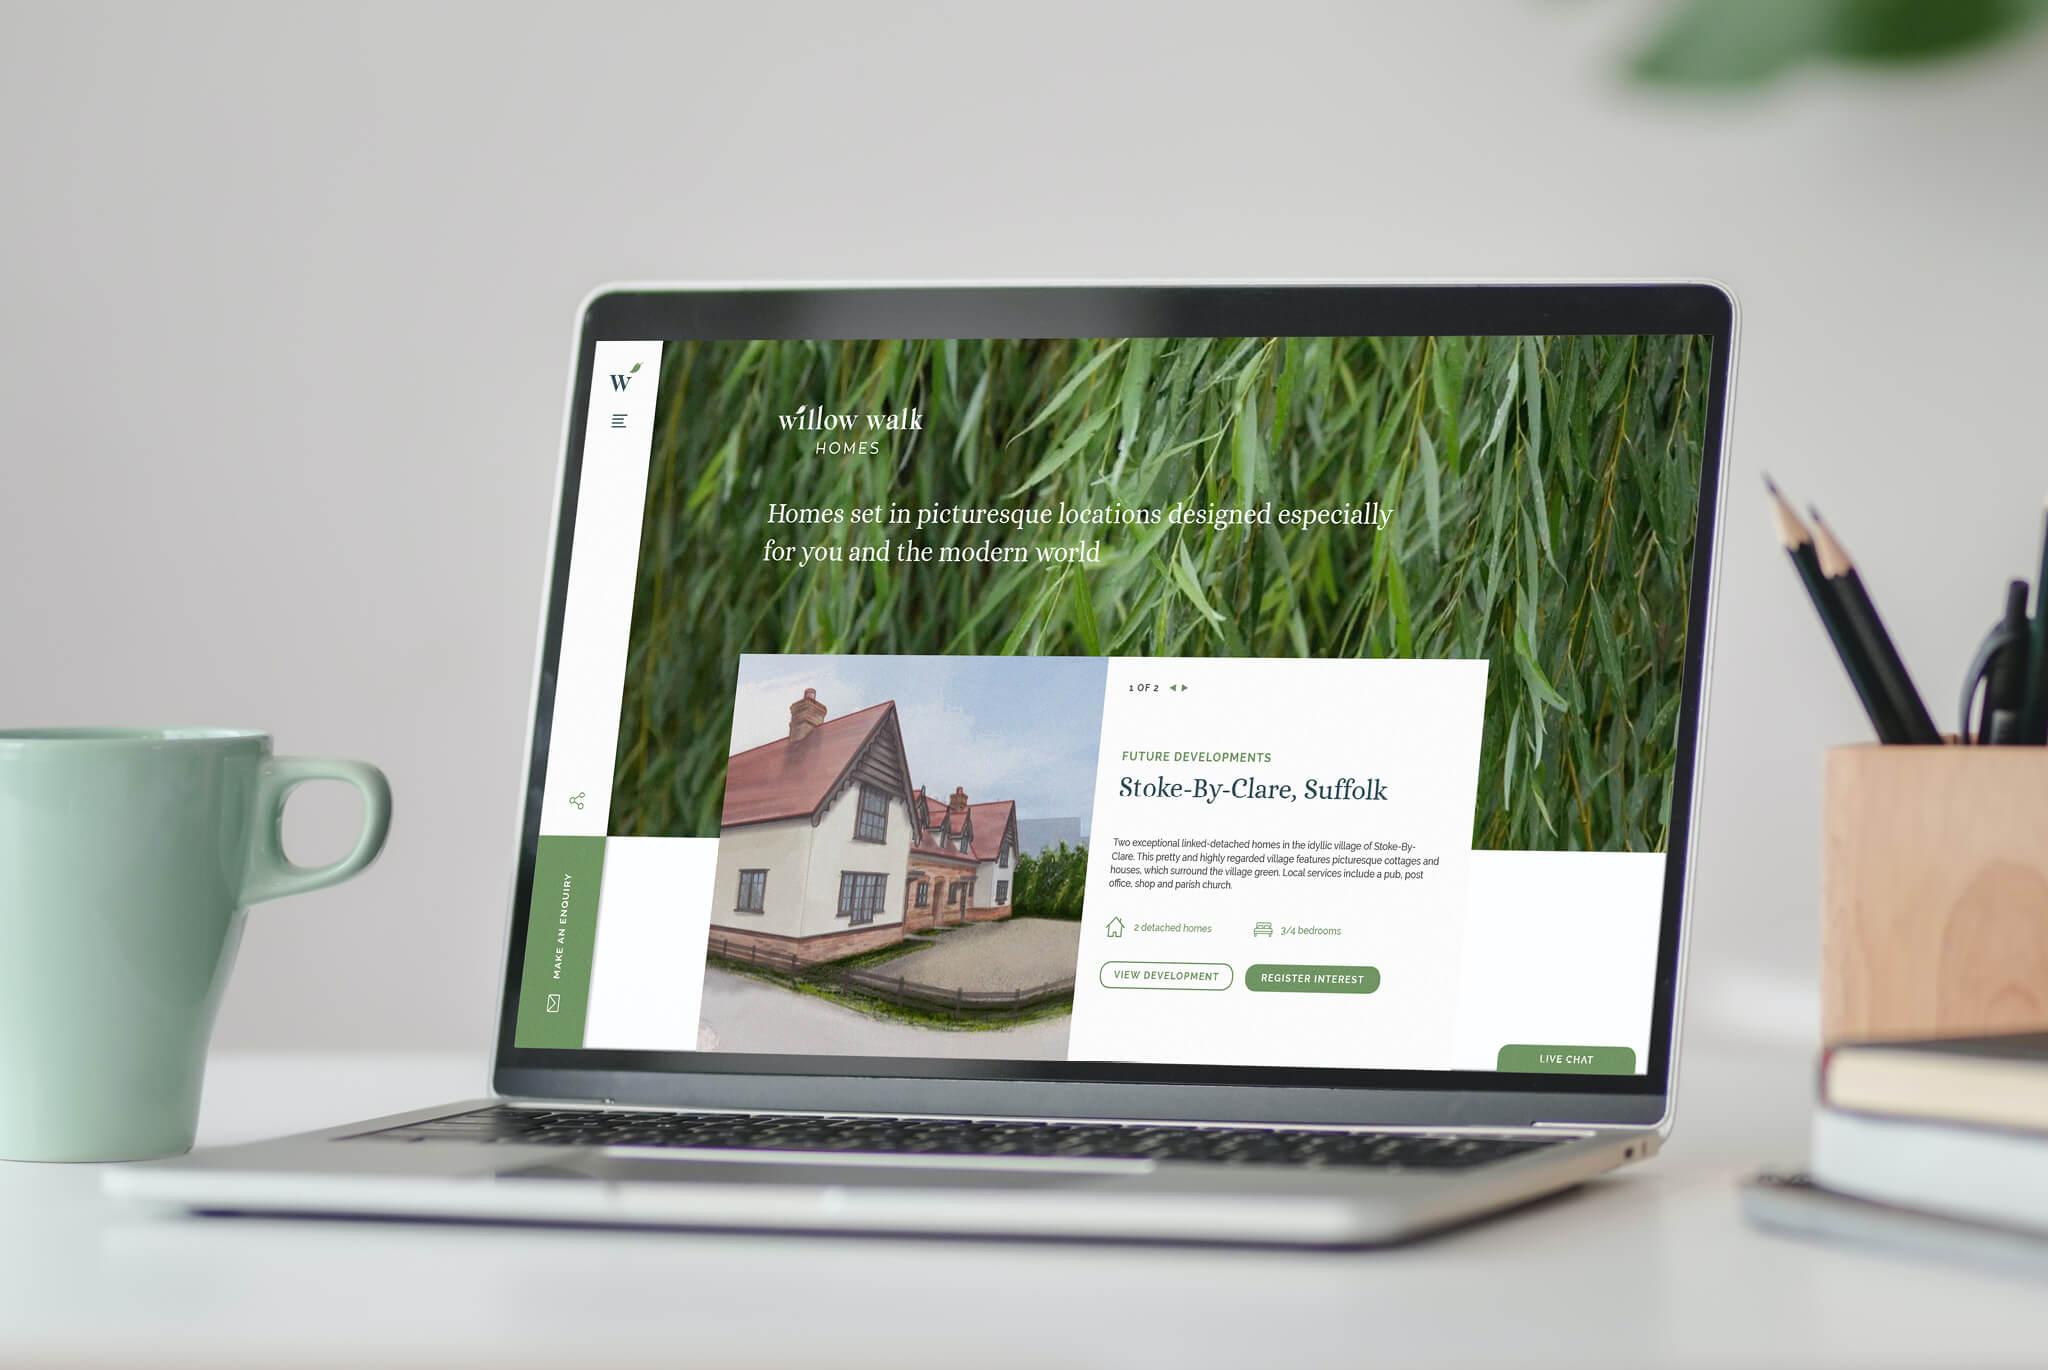 Willow Walk Homes website